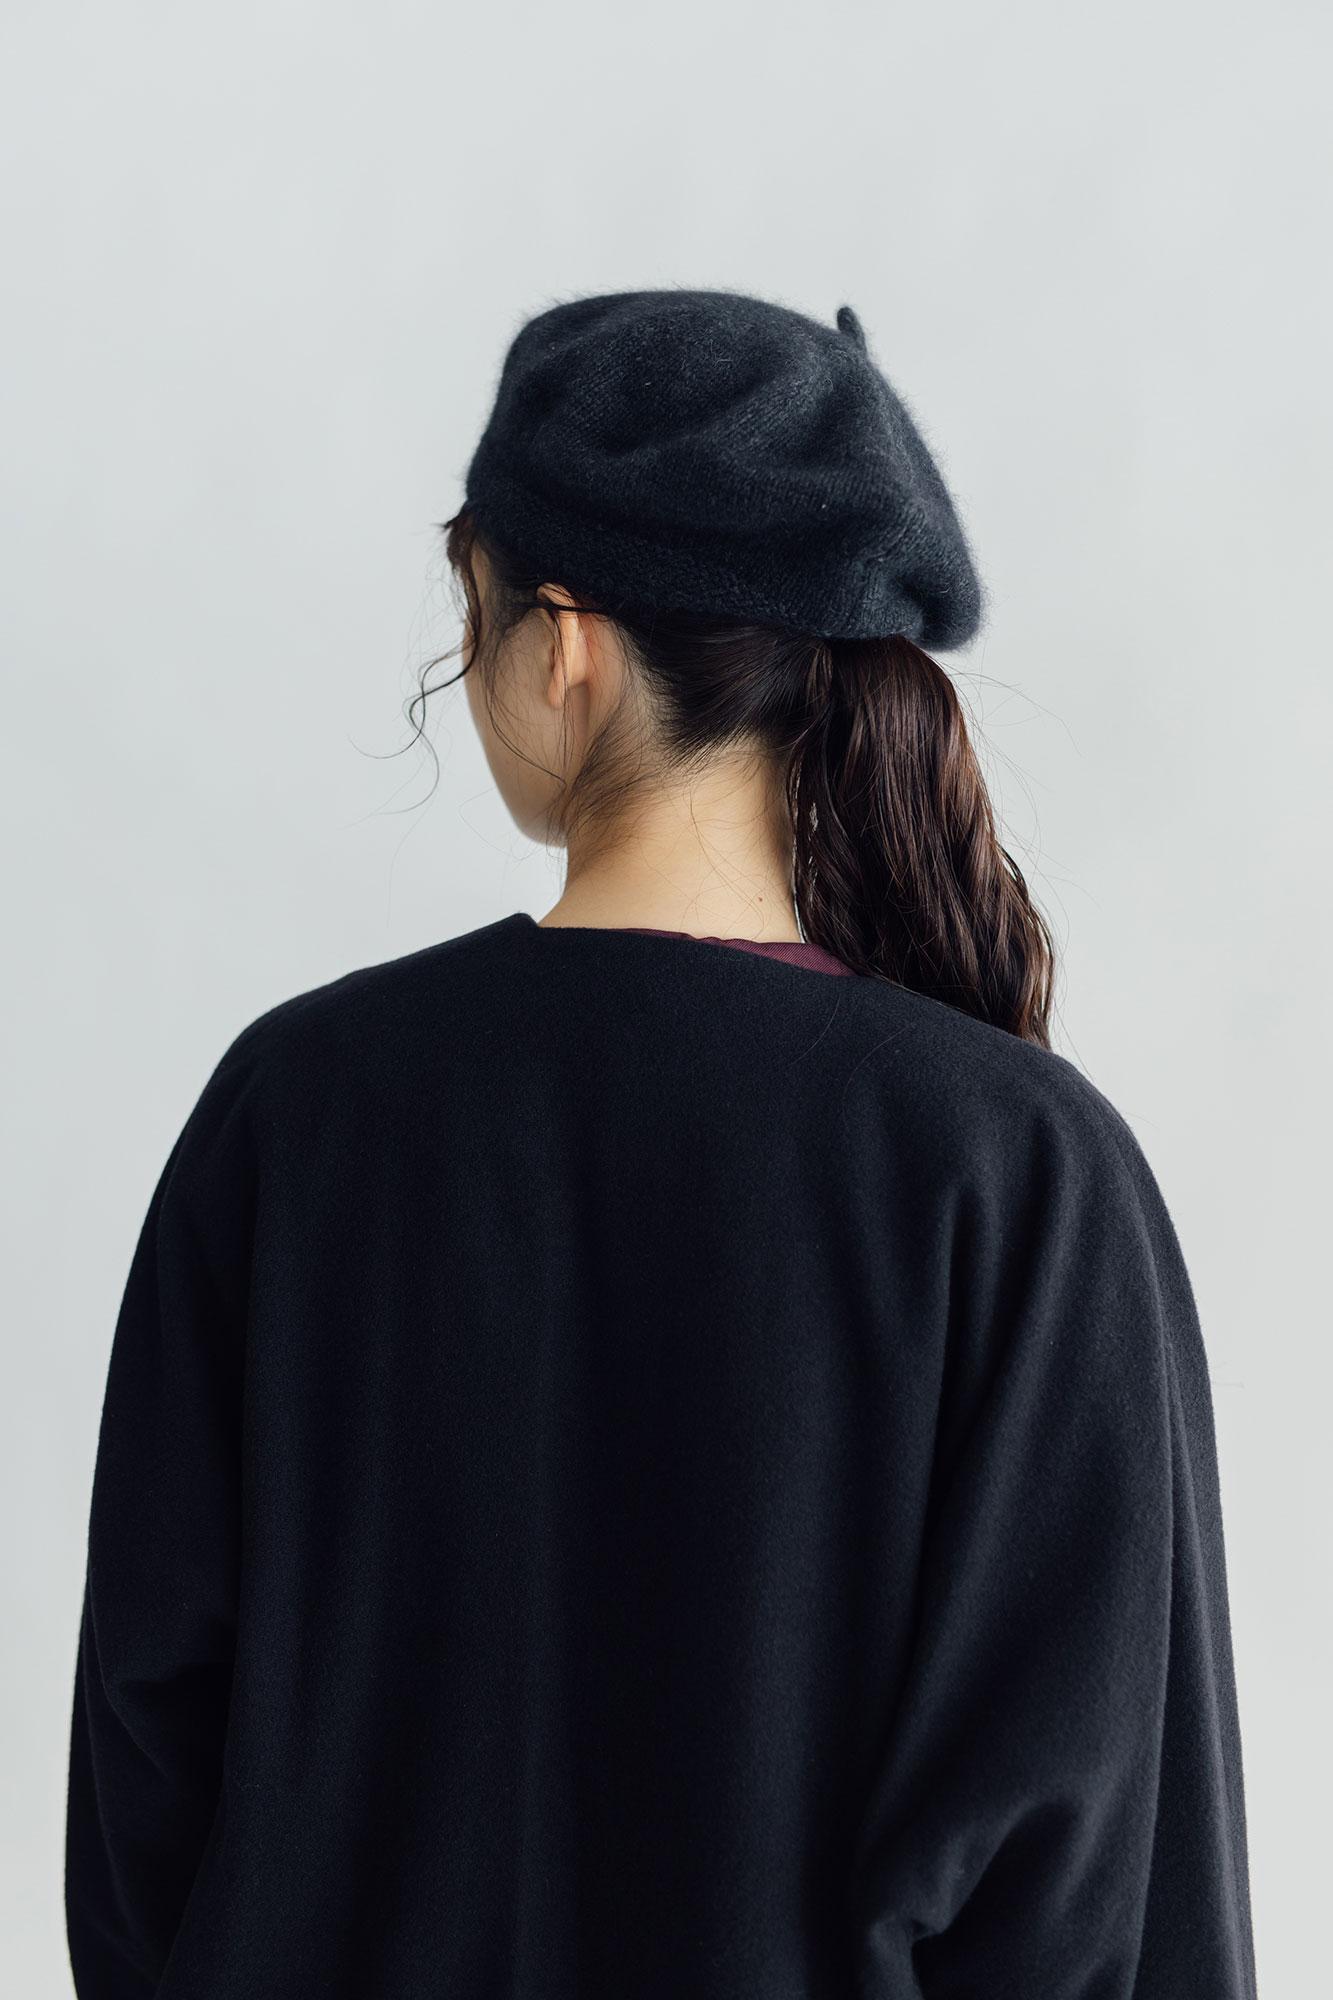 Atelier d'antan Verlaibe ウール コート ブラック